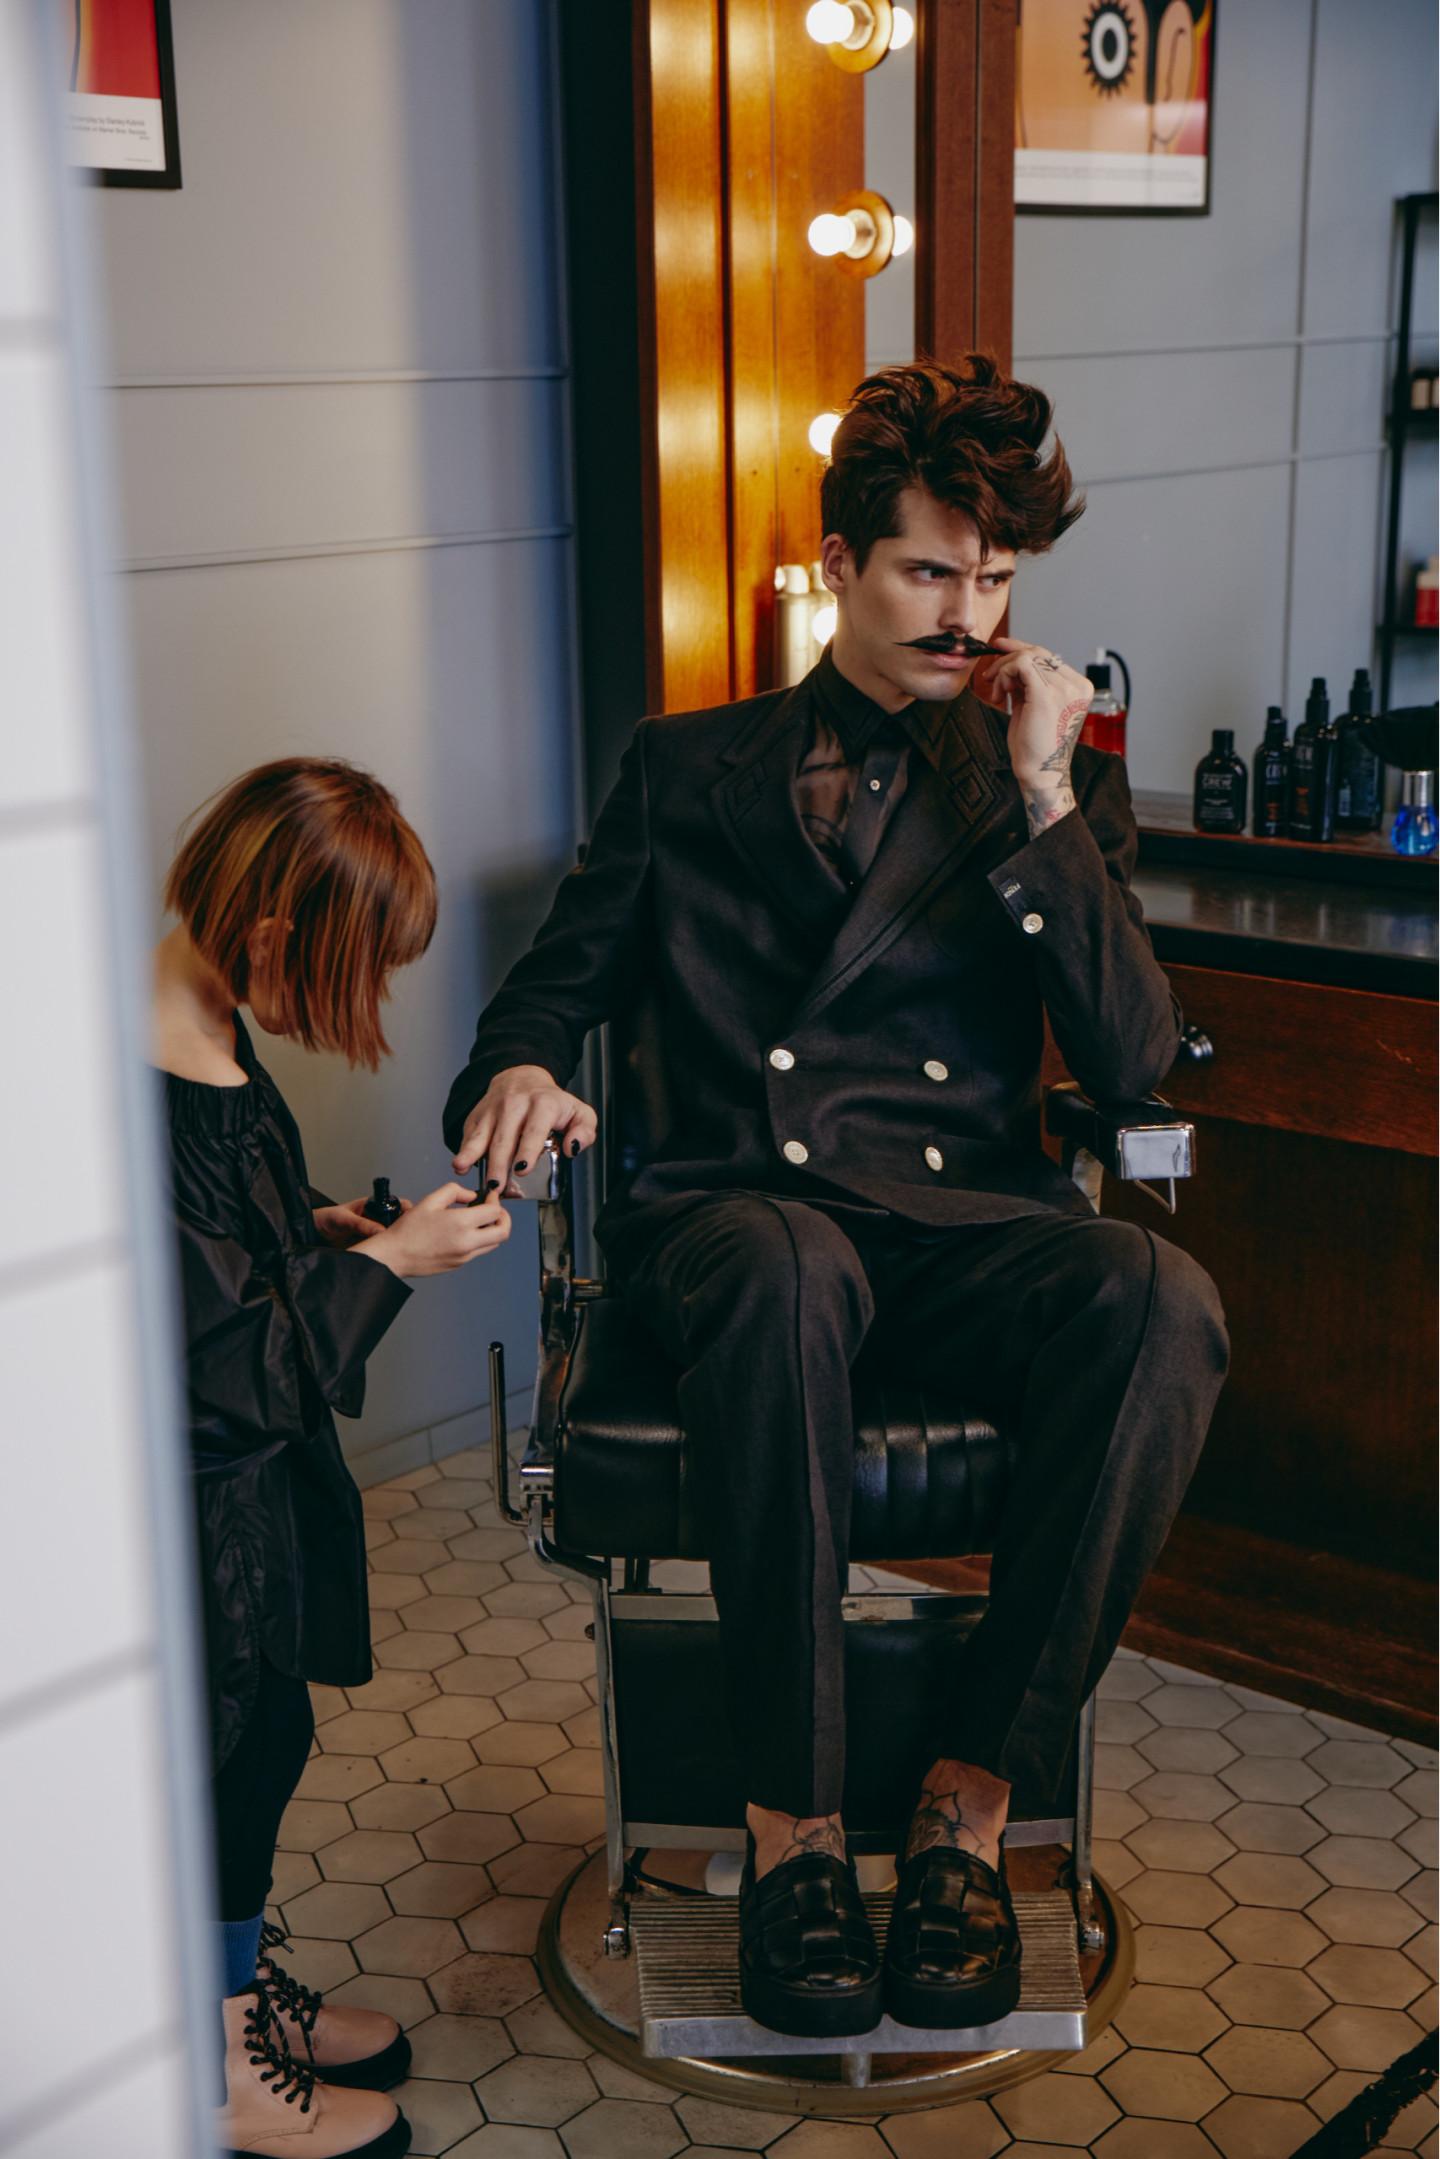 На Еве: топ Max Mara (ГУМ) На Артуре: пиджак, сорочка, брюки — все Fendi (бутик Fendi); ботинки Vic Matie (No One)